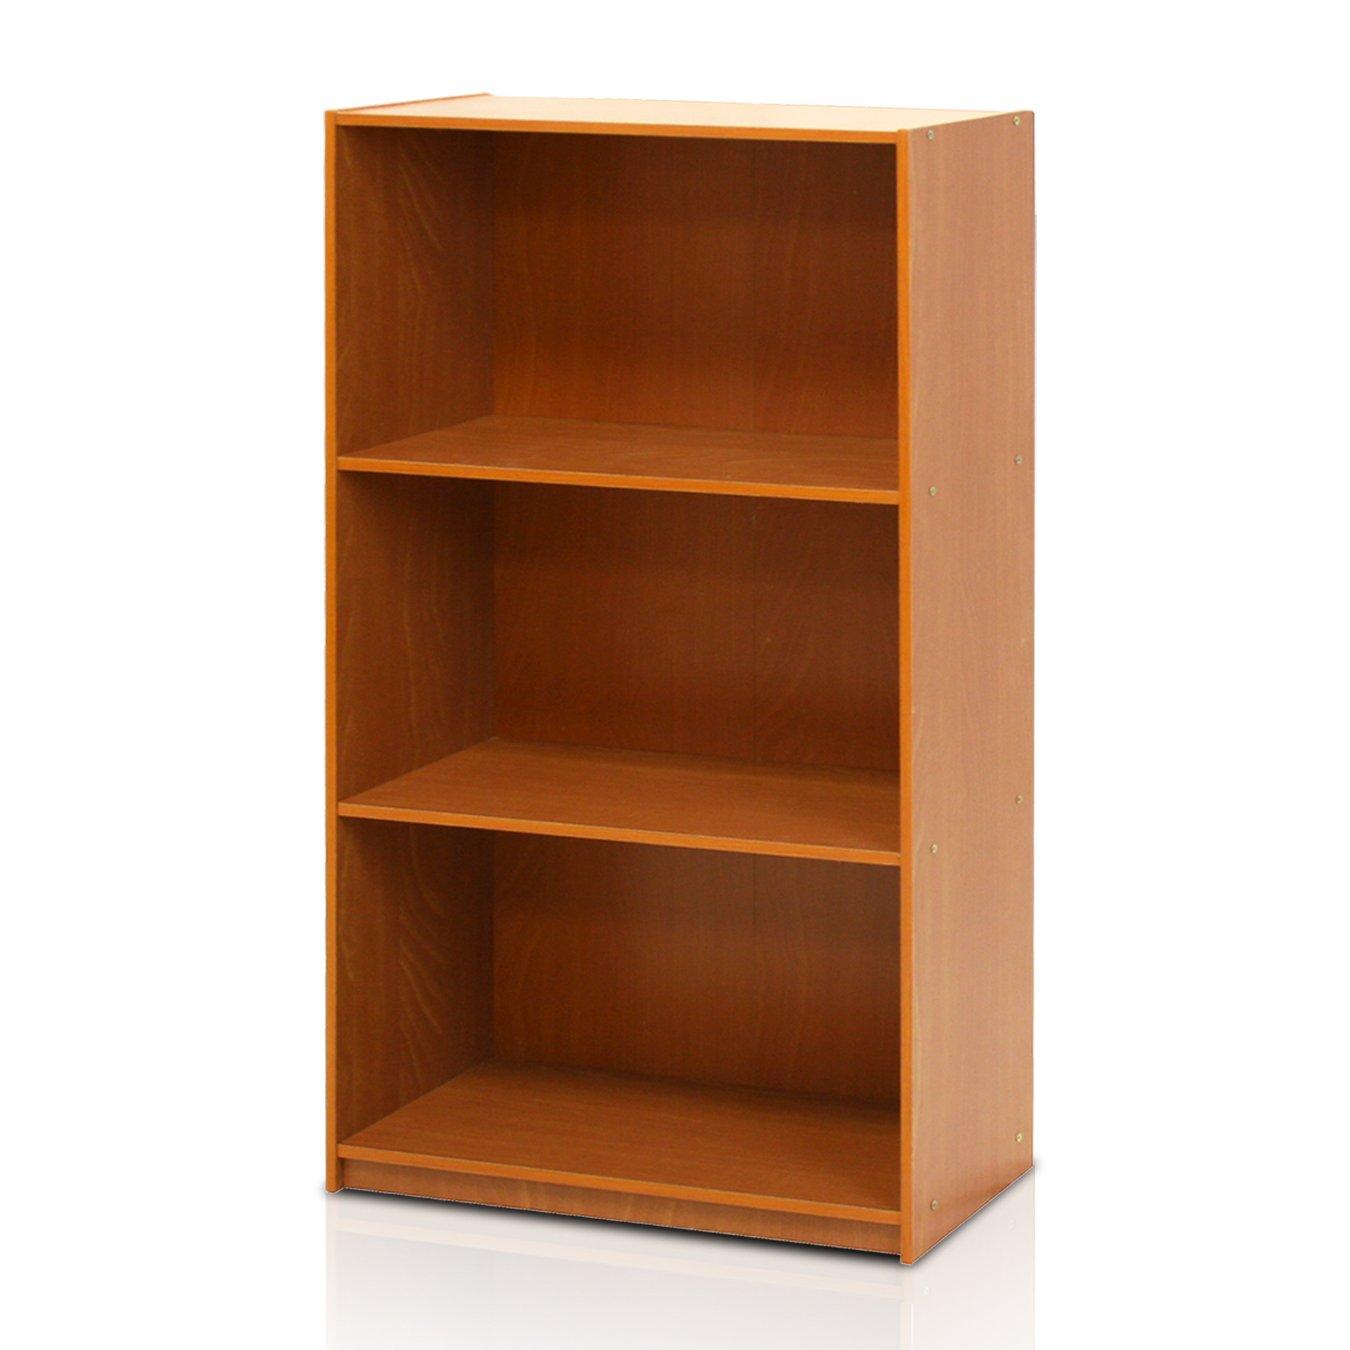 en kallax orange bookcases gb yellow bookcase art furniture shelving products cm ikea unit storage